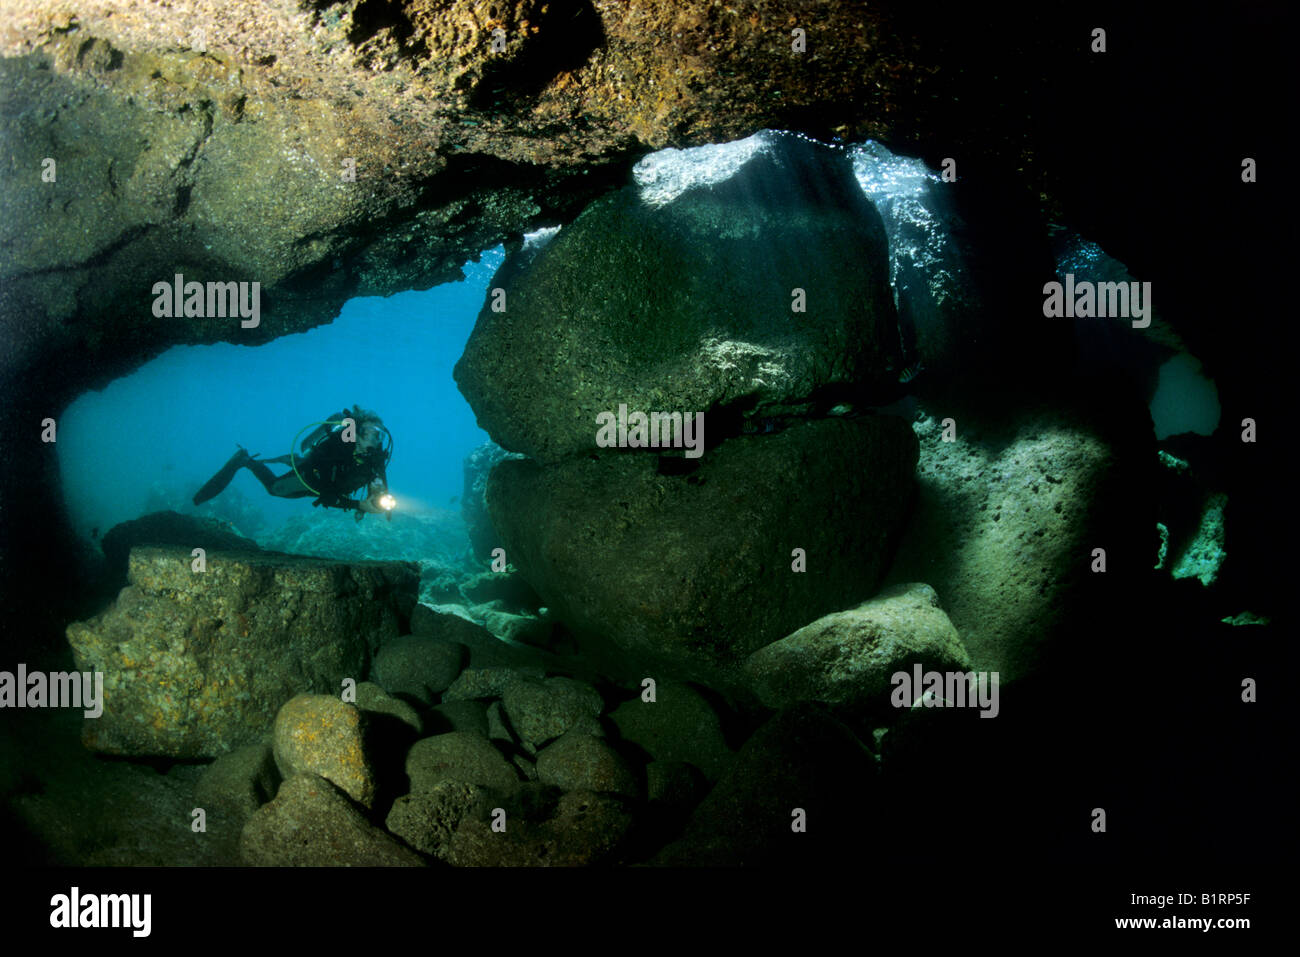 Scuba diver exploring an underwater cave, Musandam, Oman, Middle East, Indian Ocean - Stock Image